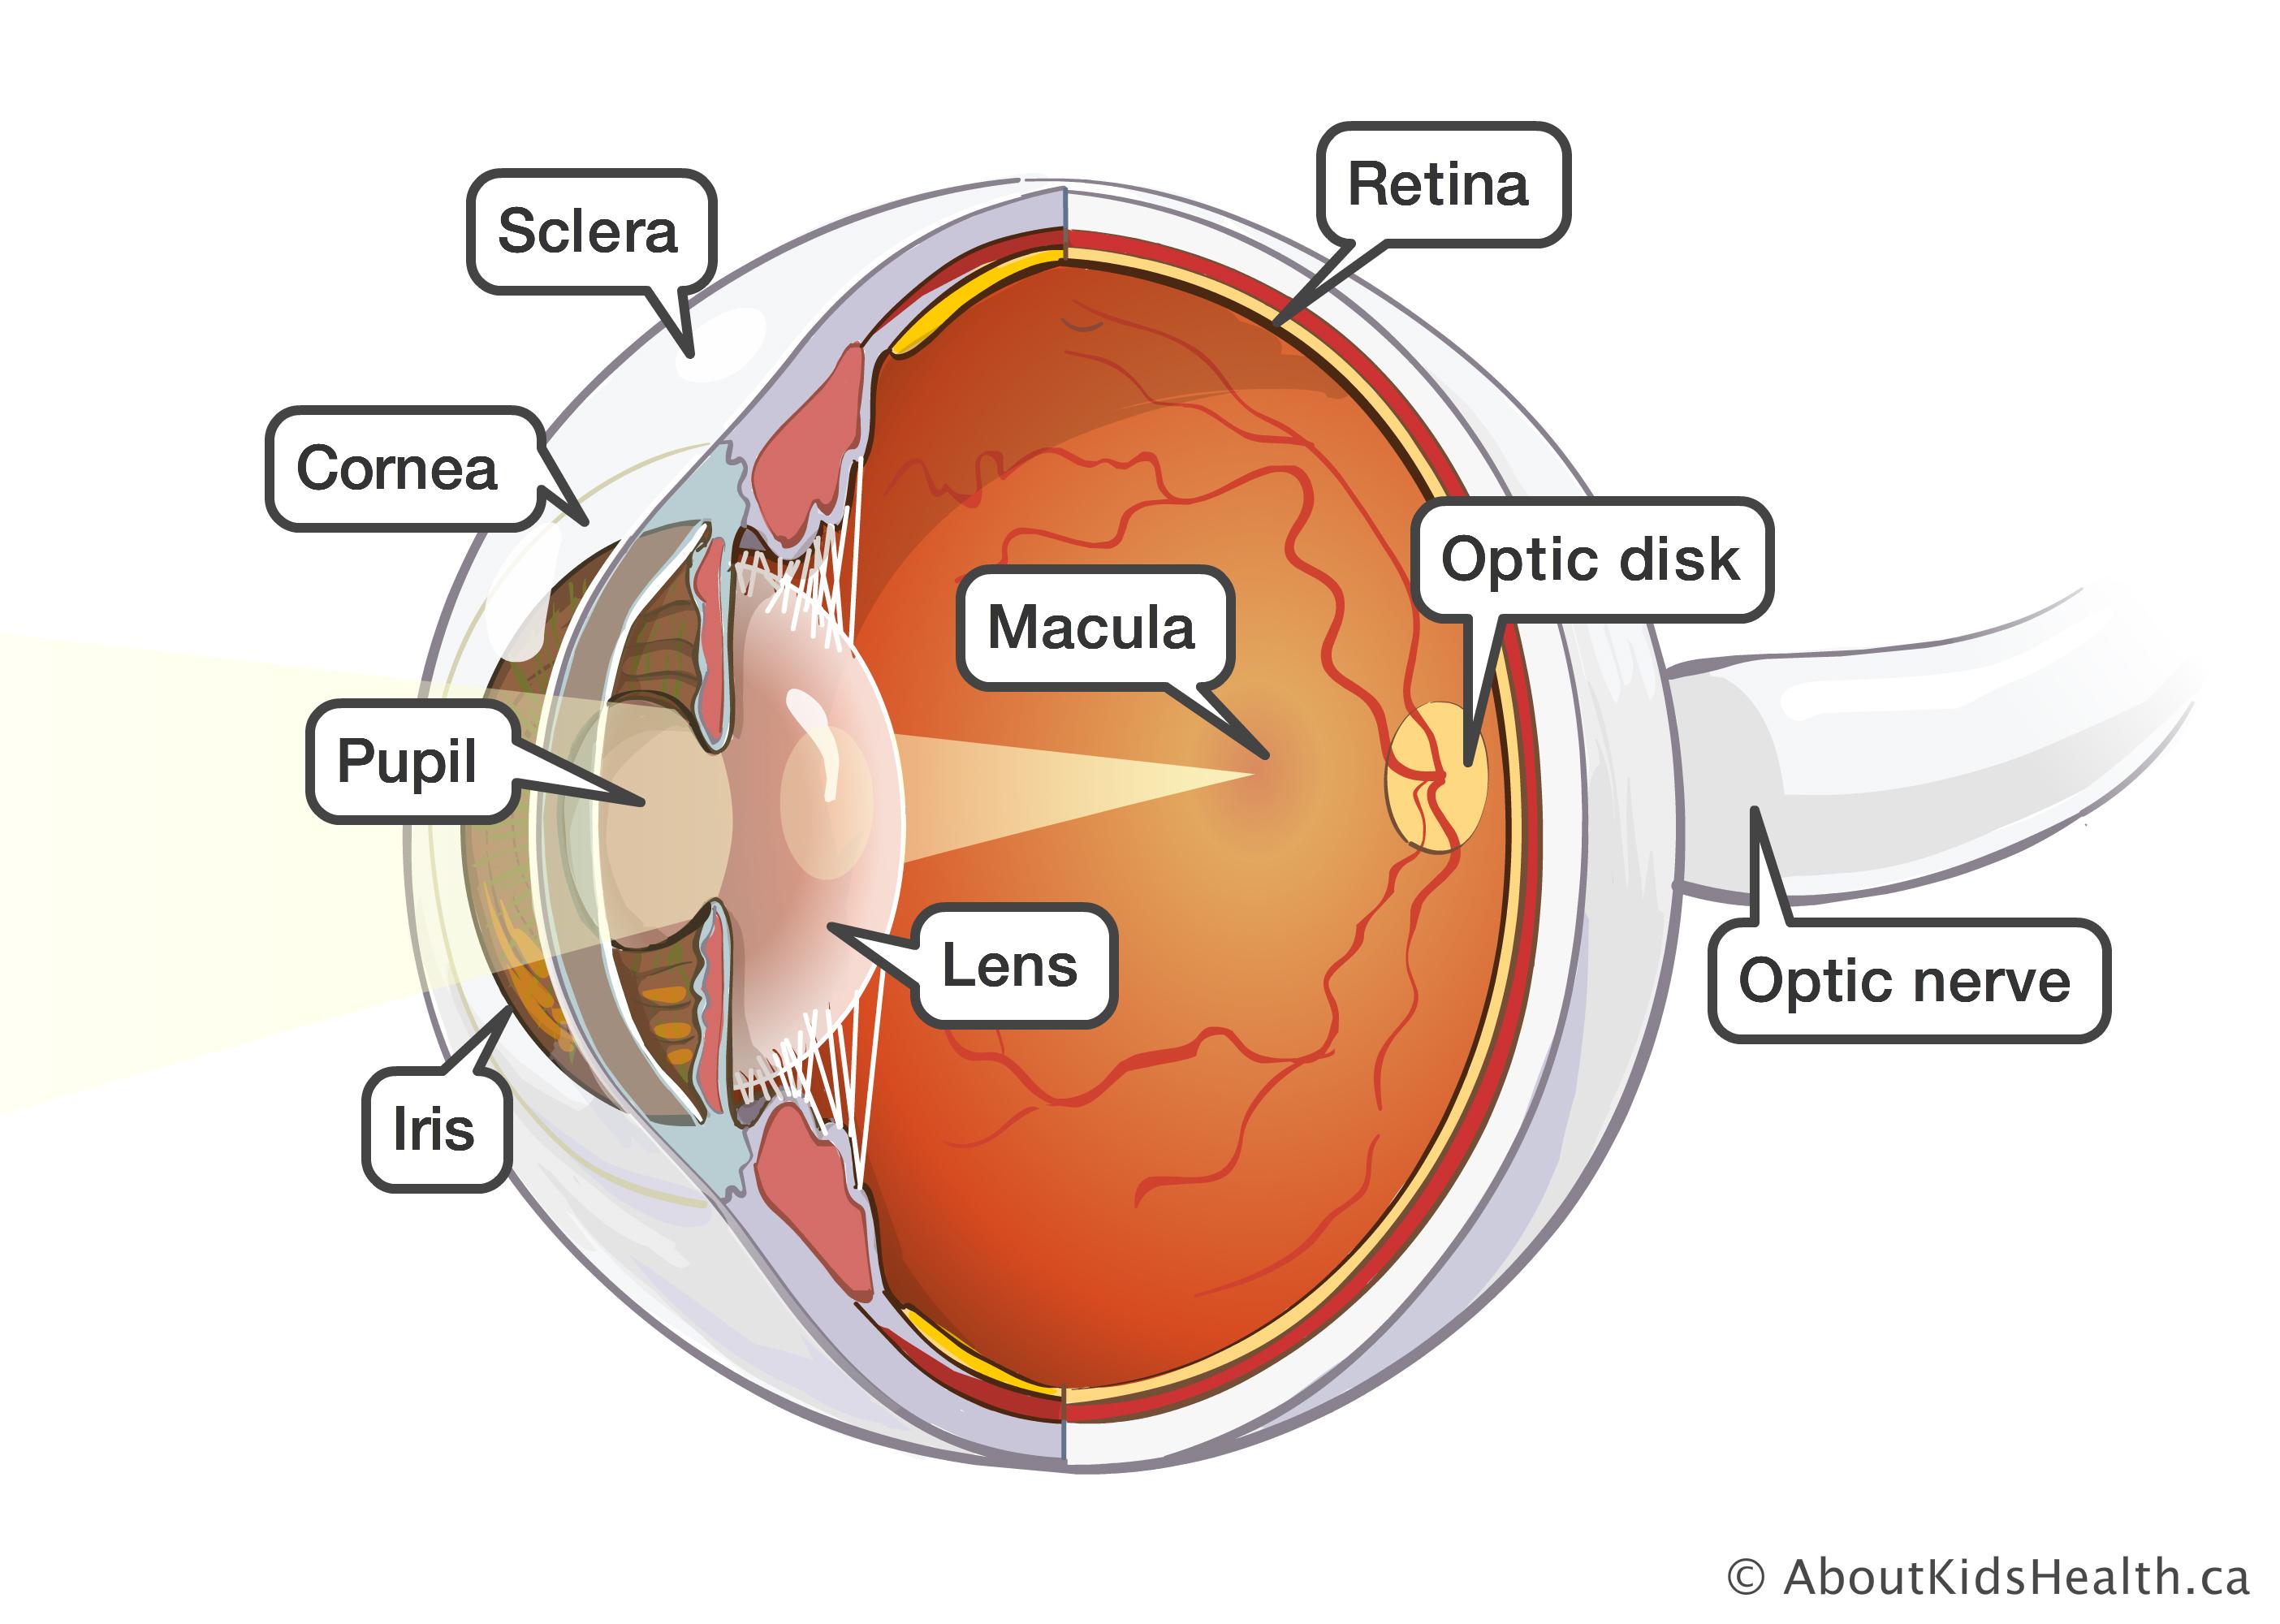 medium resolution of eye anatomy and function diagram of parts of the eye diagram of parts of the eye